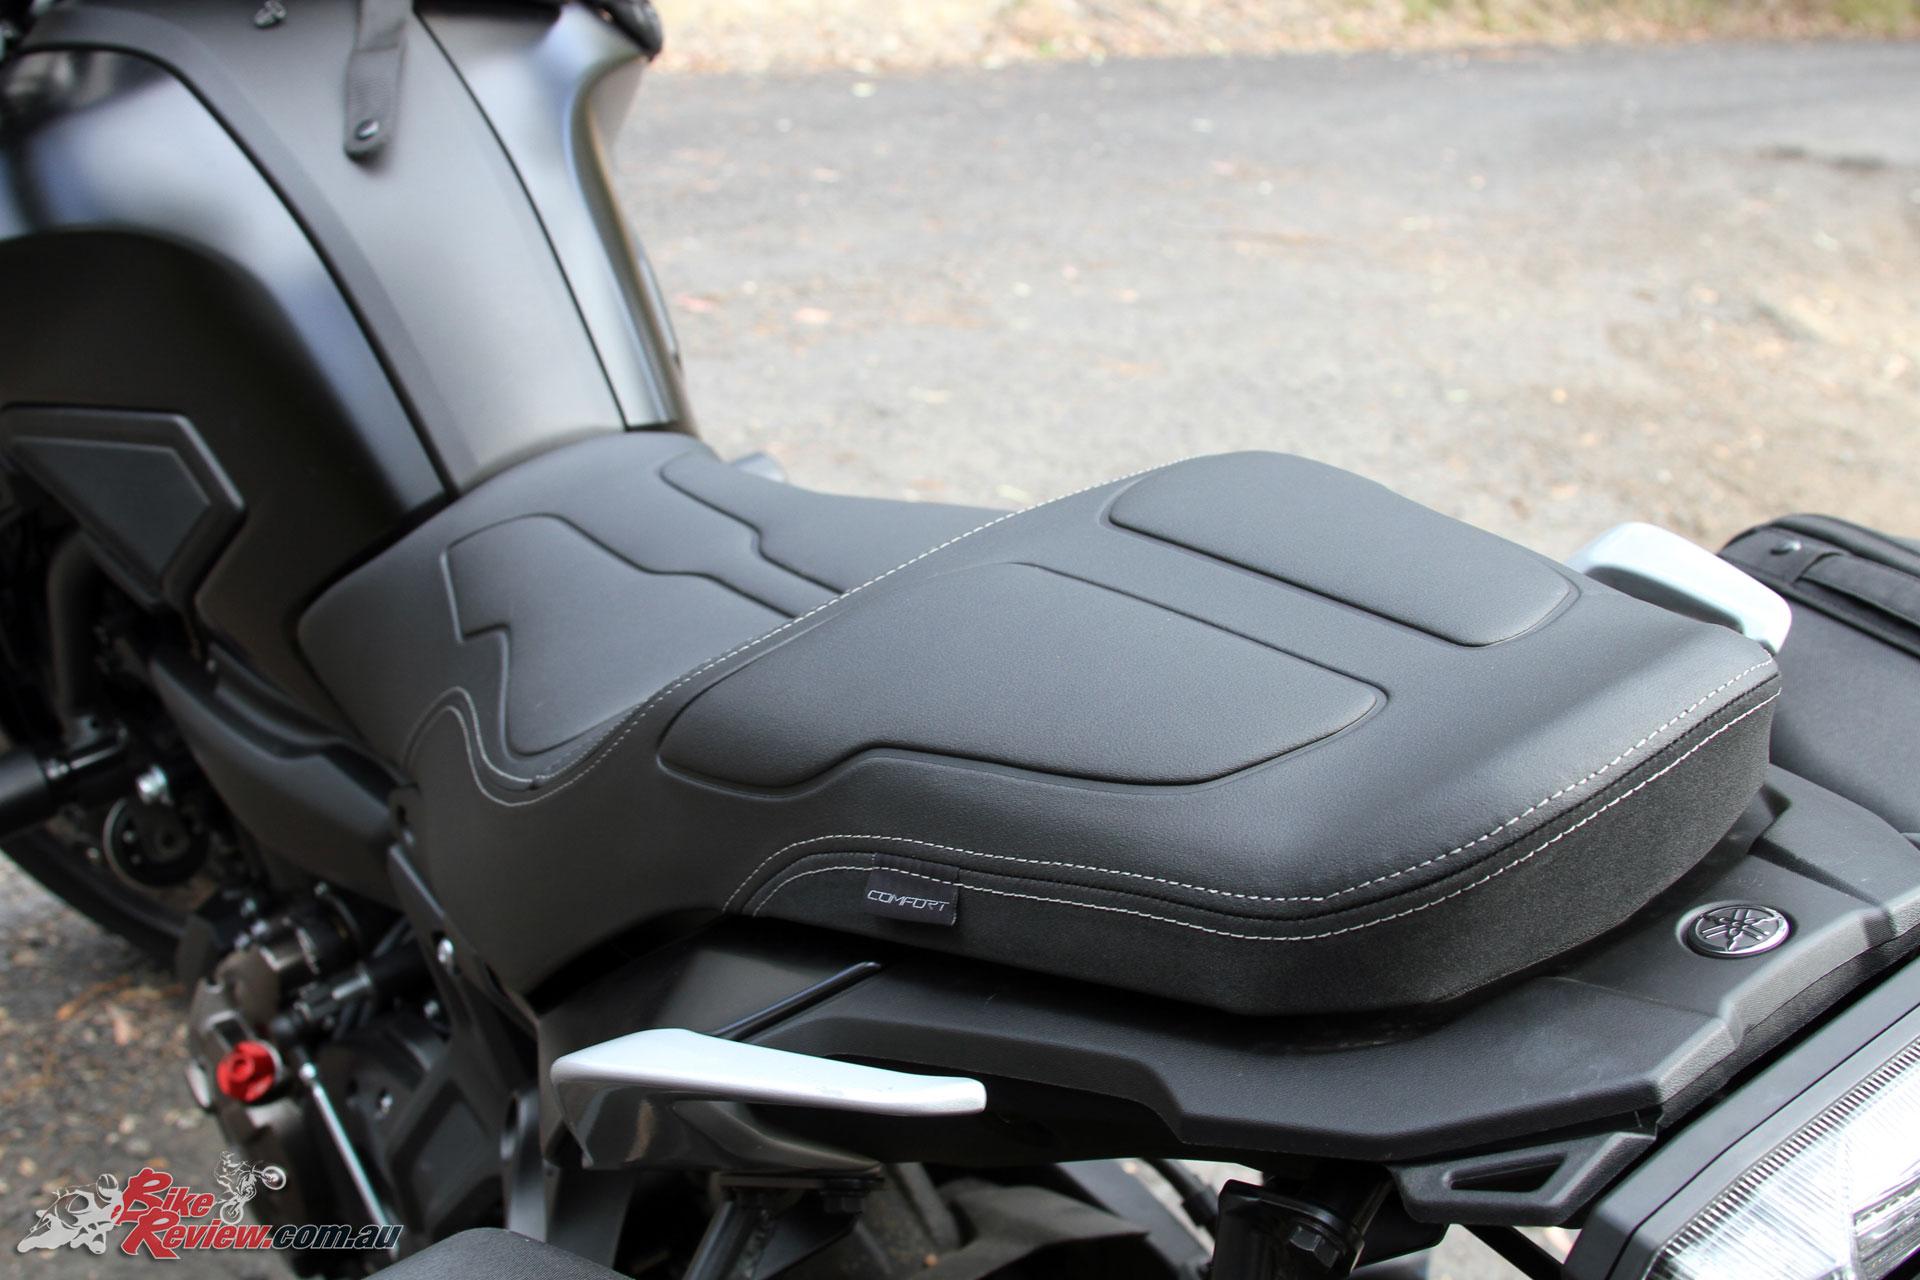 Staff Bike Yamaha Mt 07 Tracer Comfort Seat Review Bike